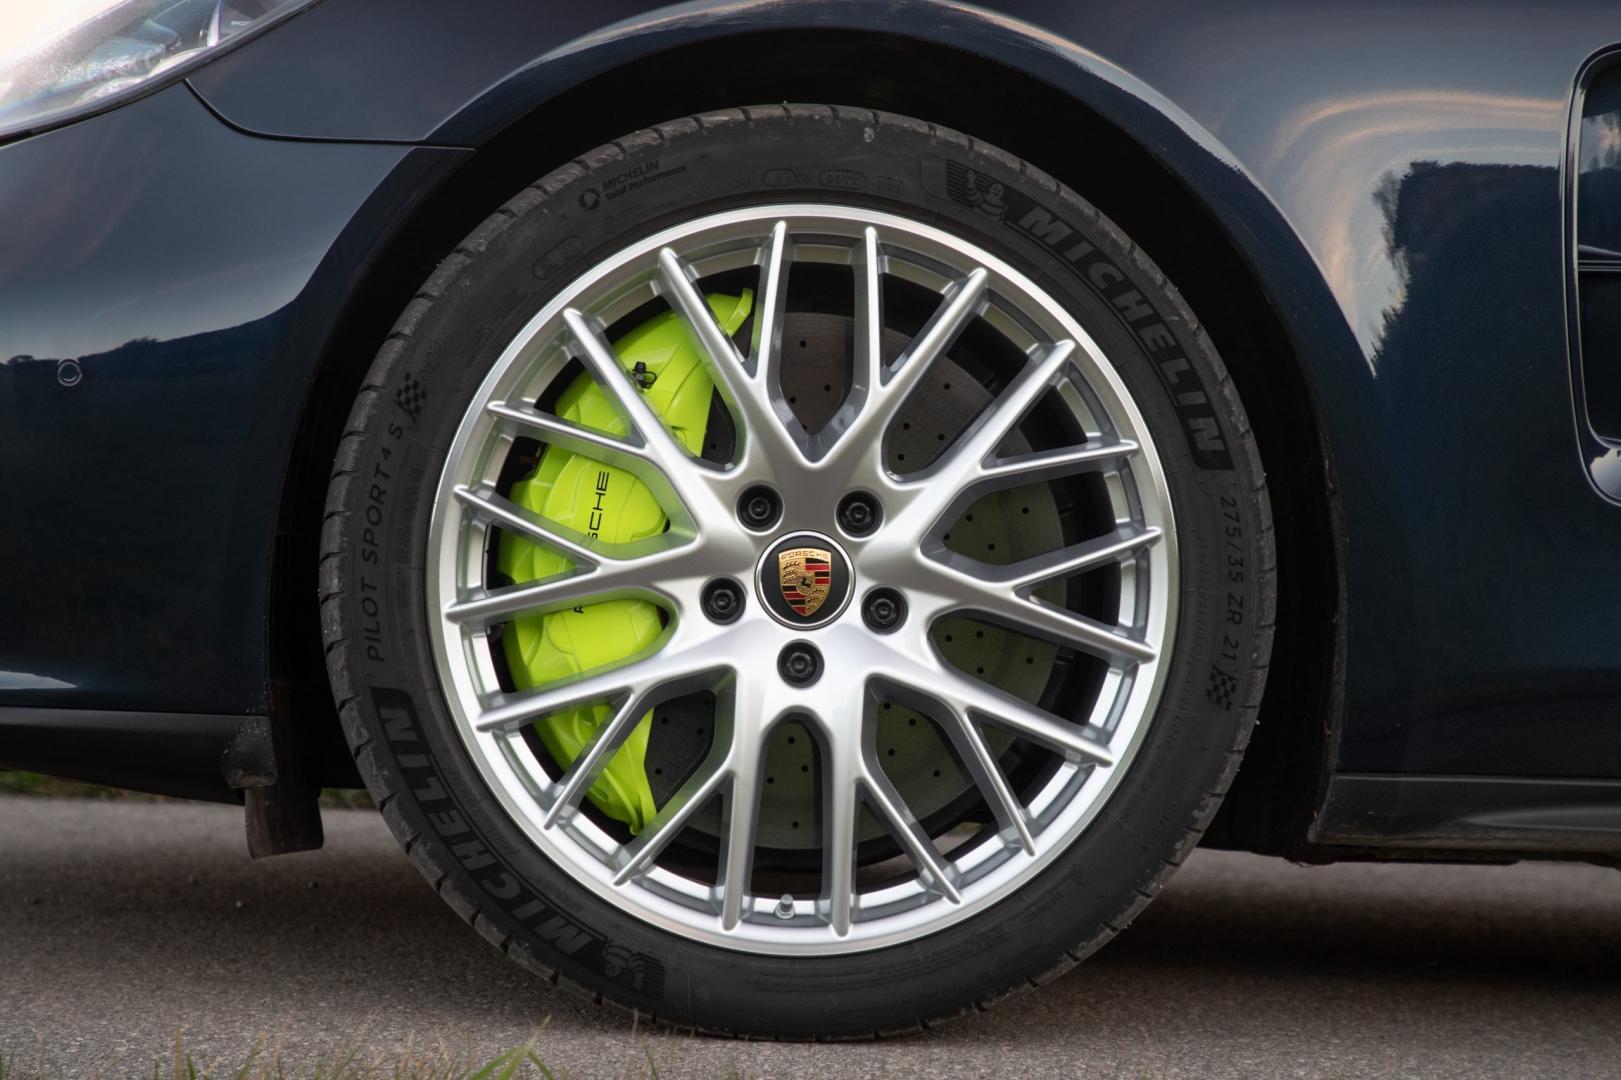 Porsche Panamera Turbo S E-Hybrid Sport Turismo remmen en velgen